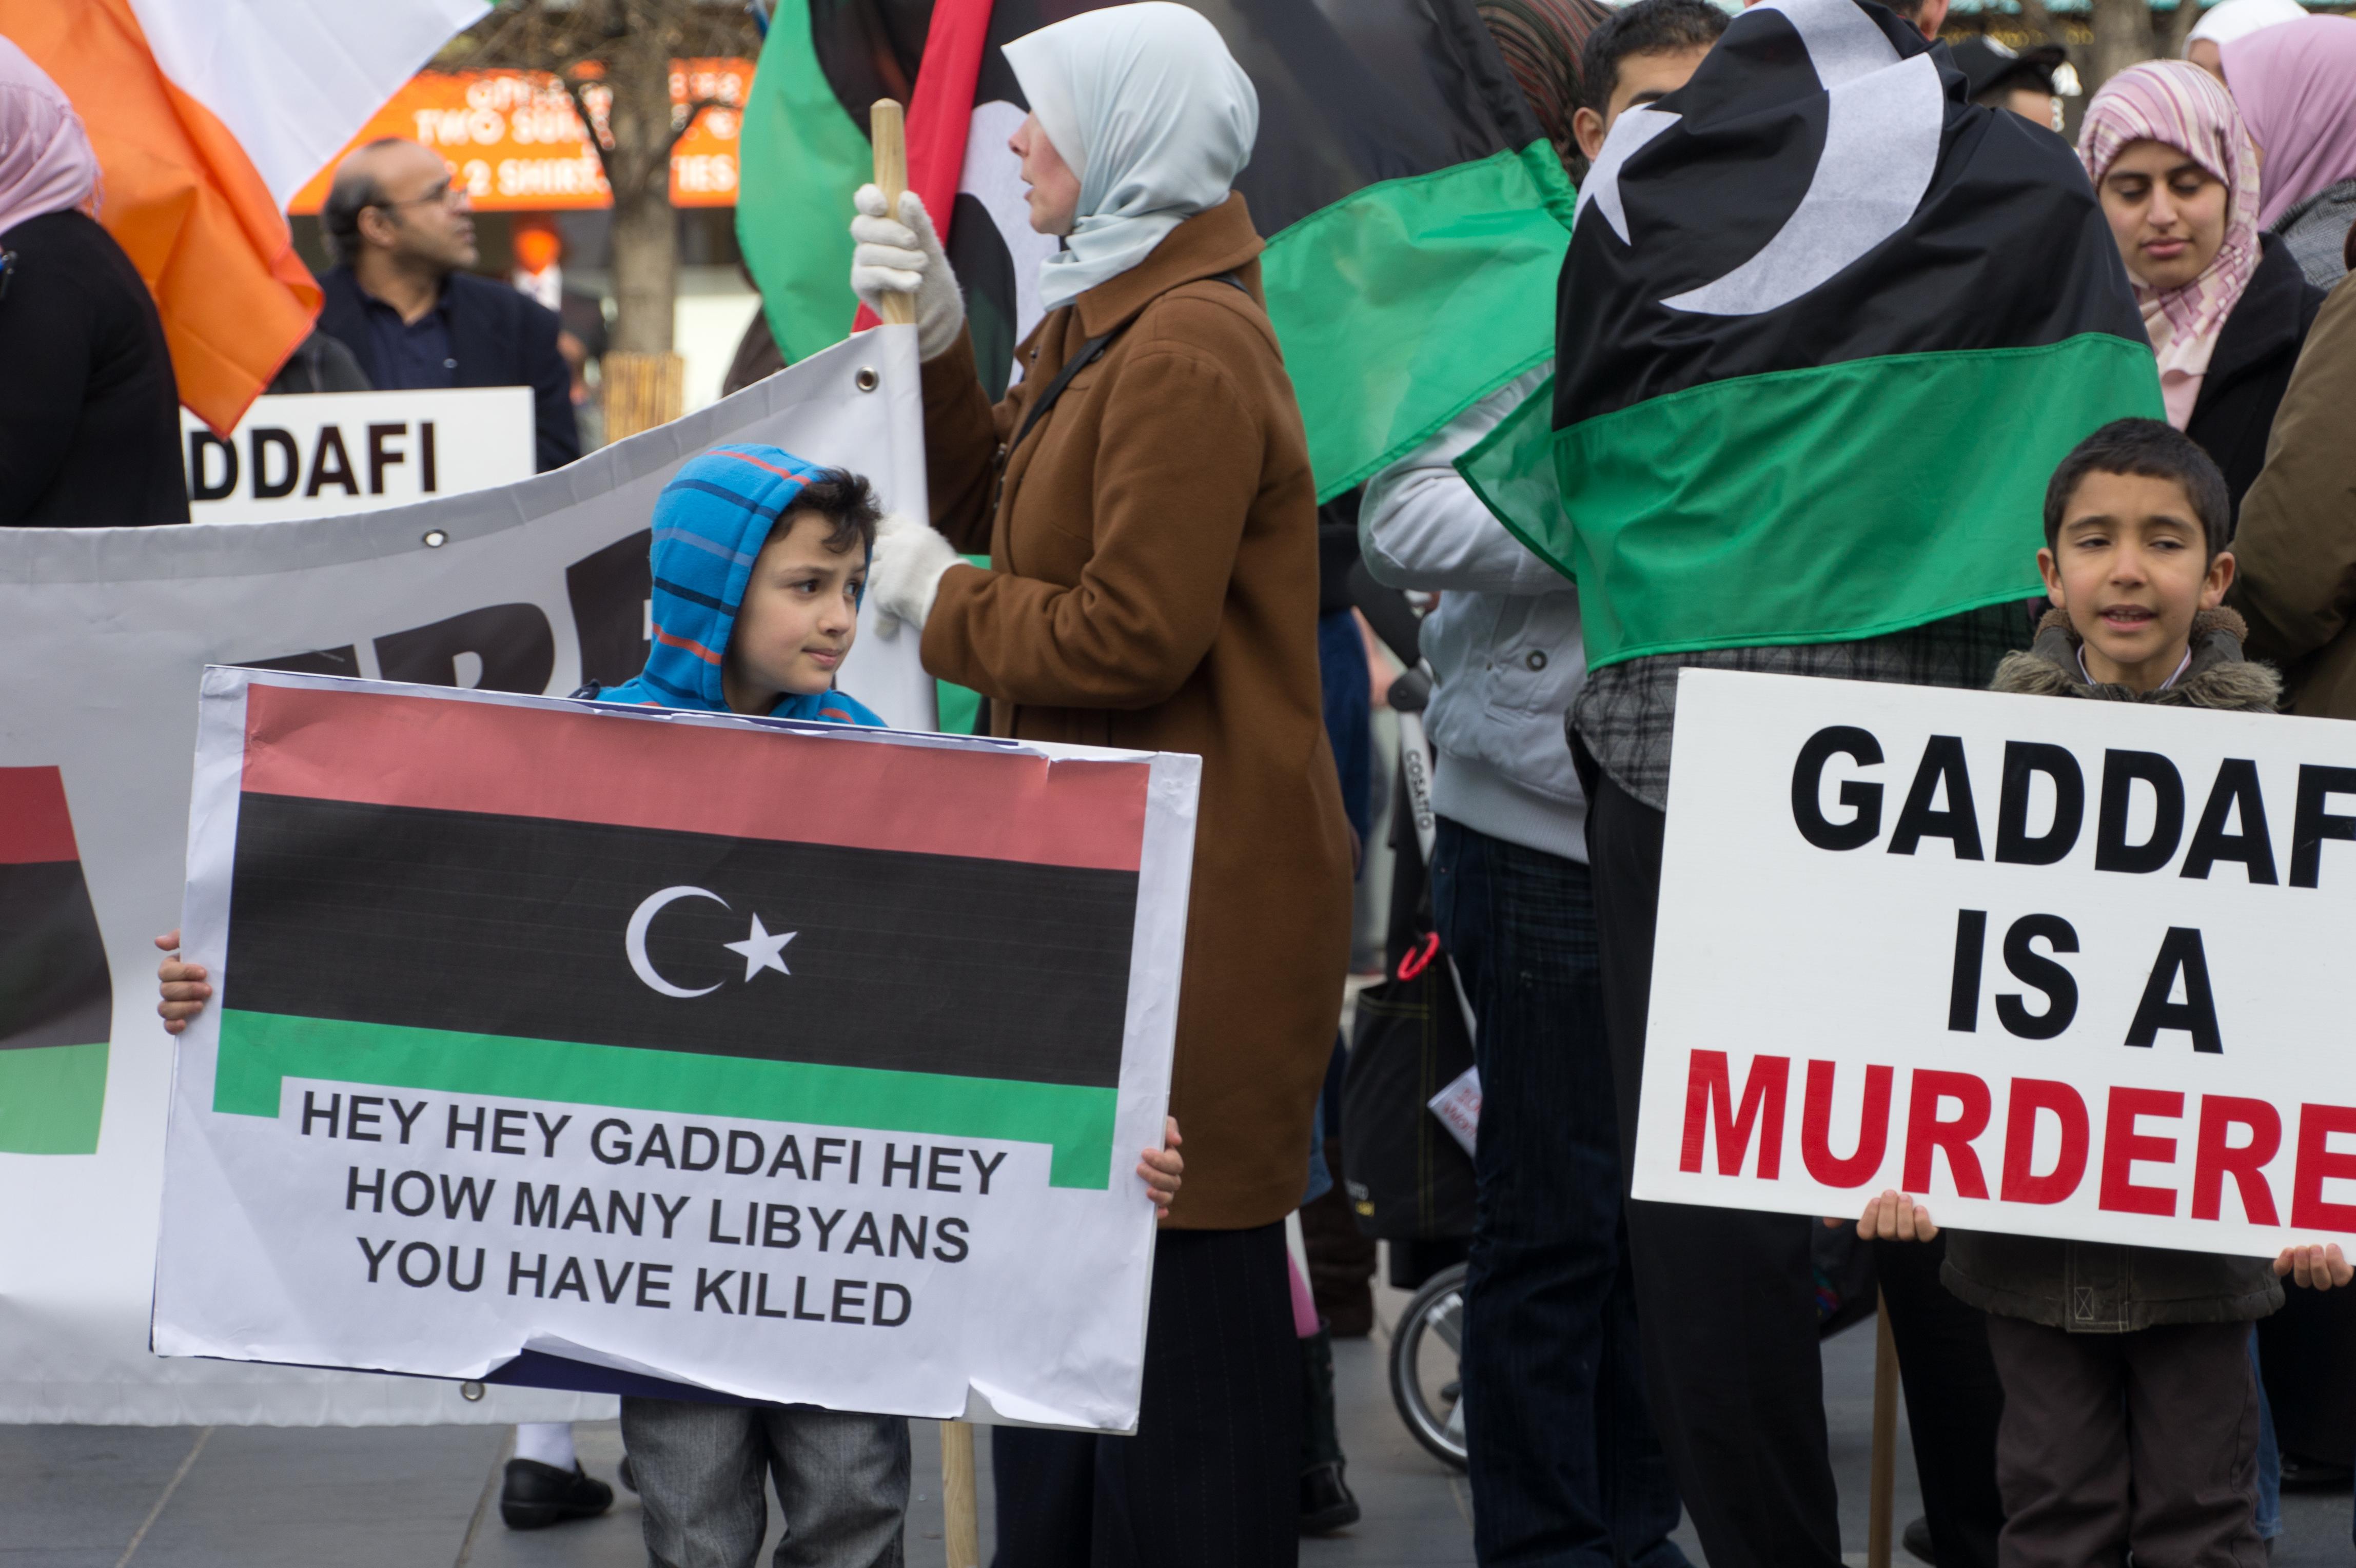 Fileprotest in dublin gaddafi is a murdererg wikimedia commons fileprotest in dublin gaddafi is a murdererg sciox Choice Image